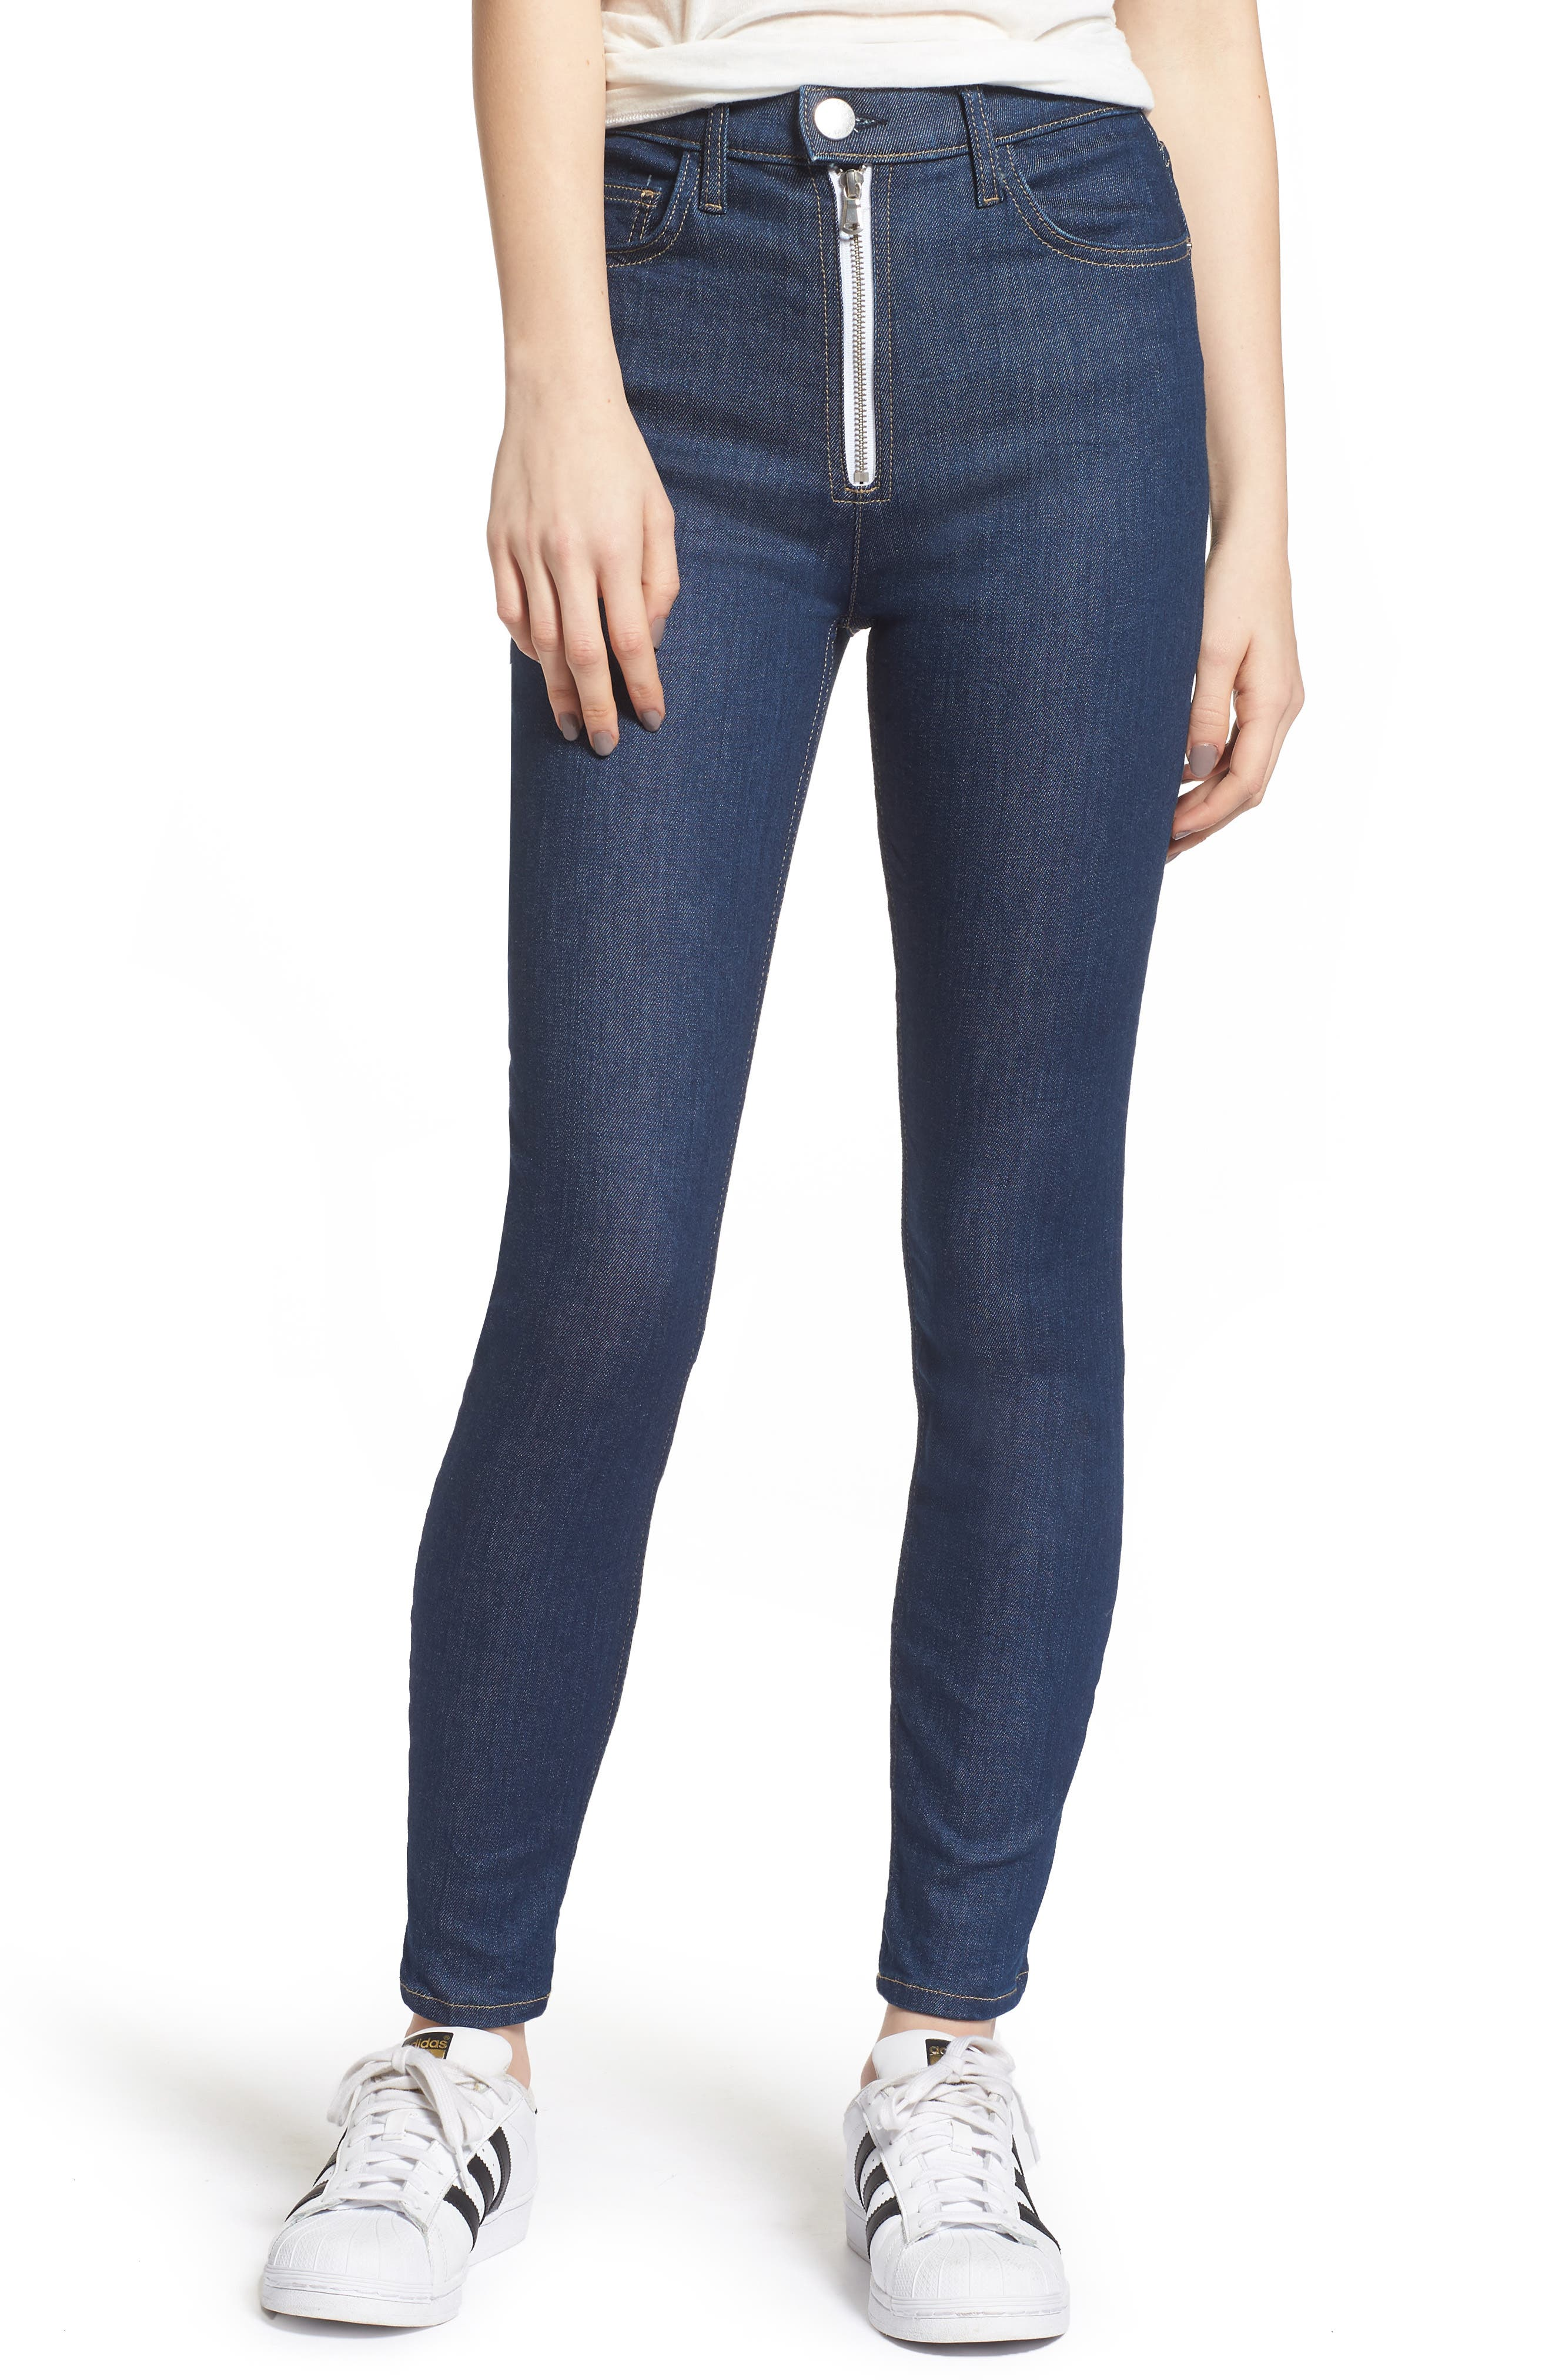 Current/Elliott The Ultra High Waist Skinny Jeans (Rinse)